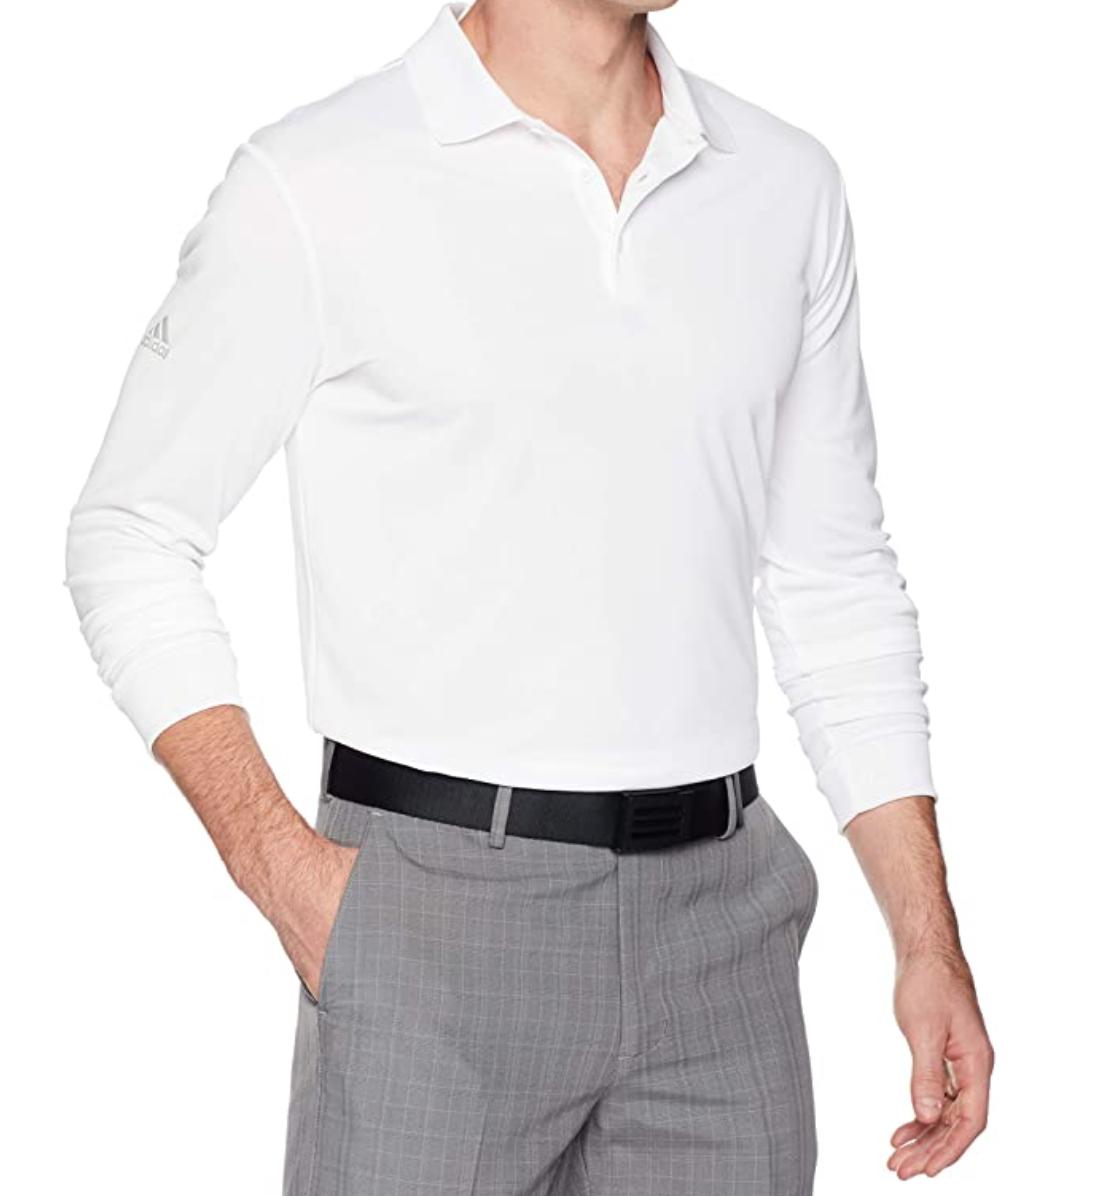 best golf shirts, adidas long sleeve polo